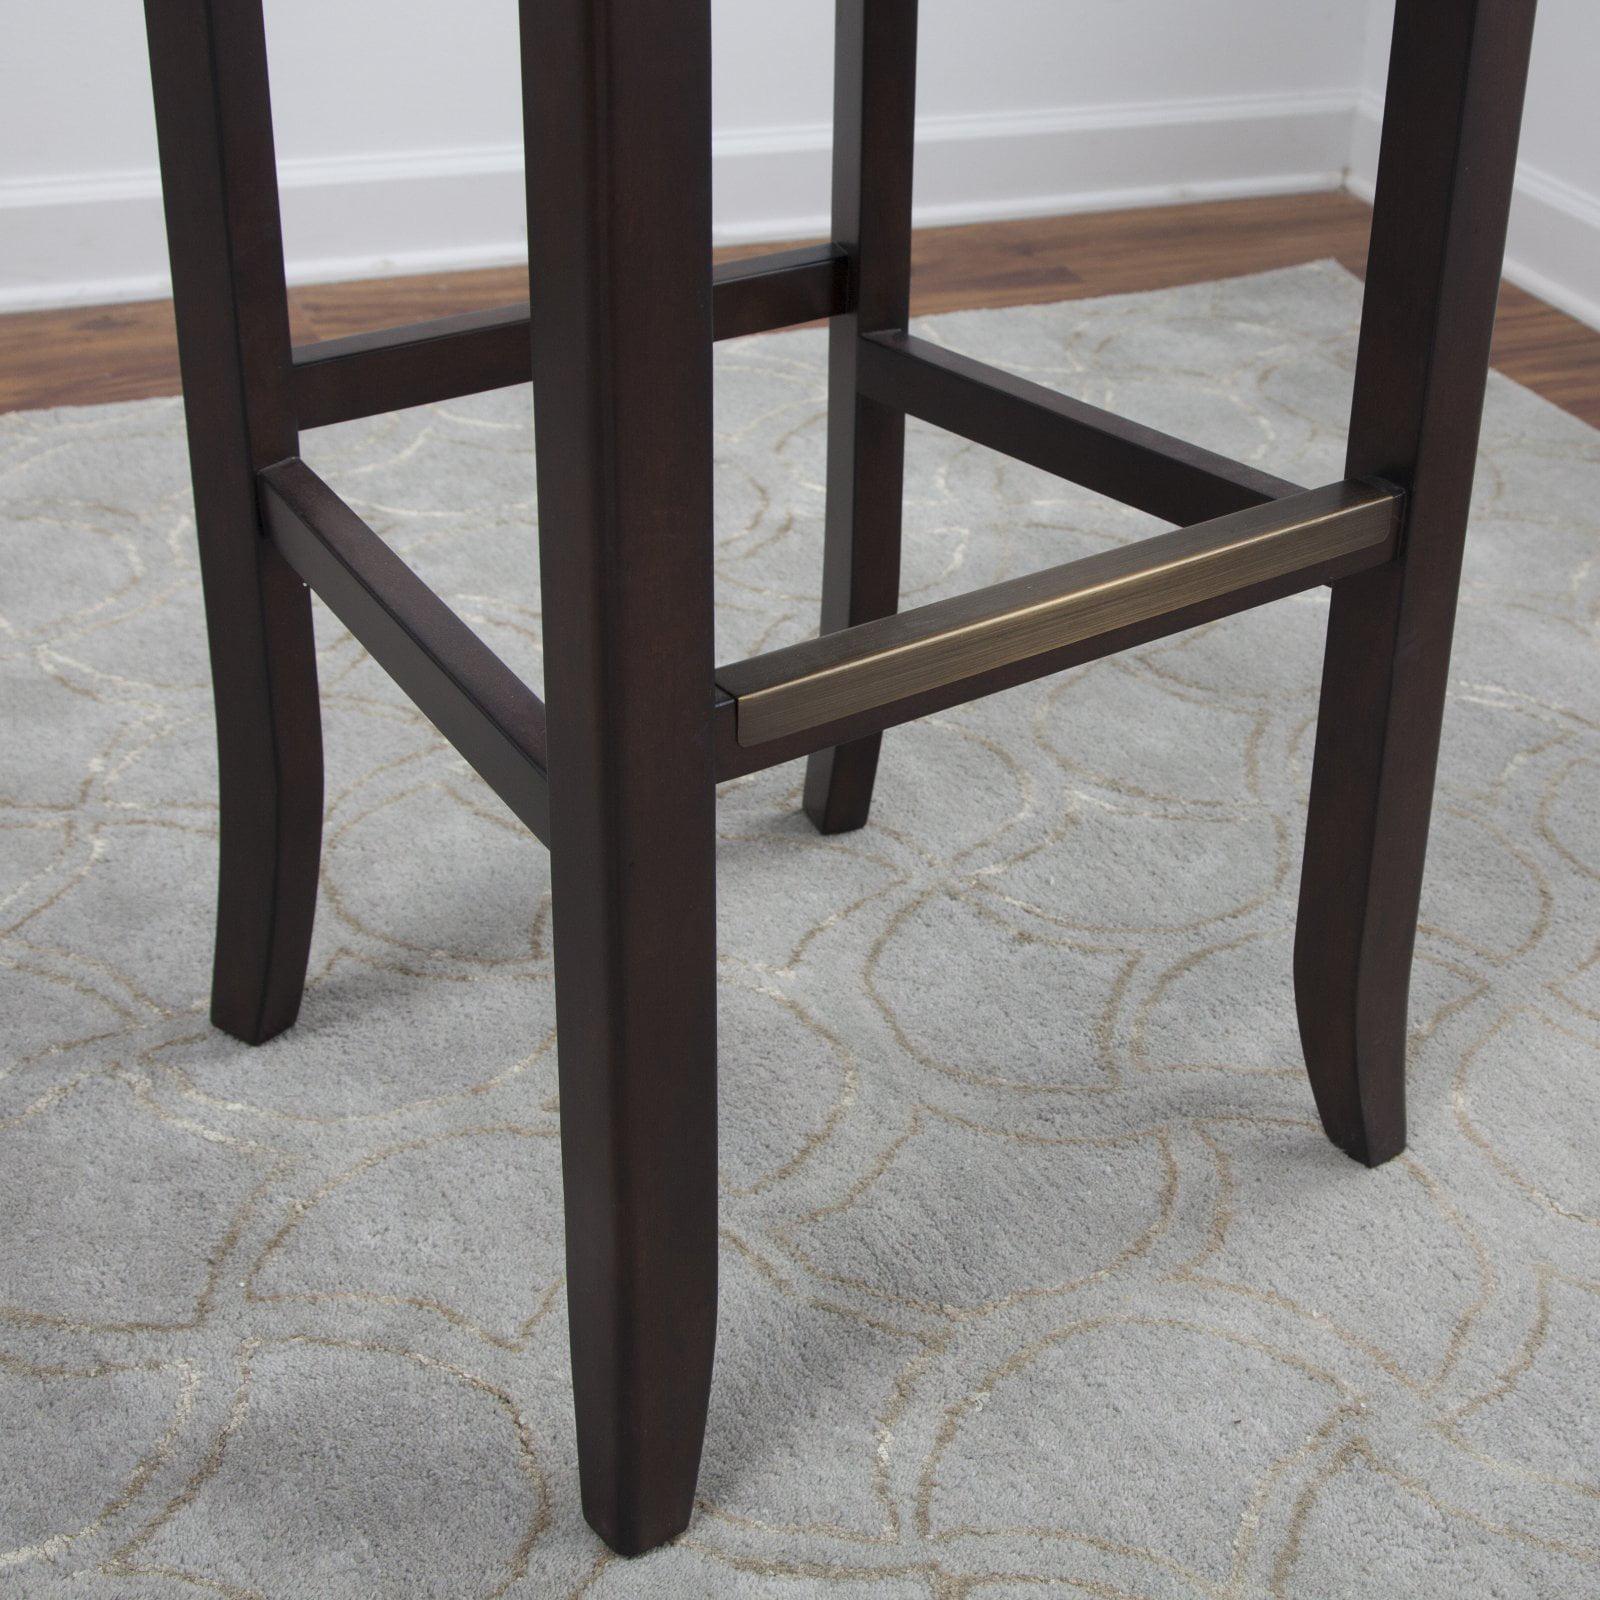 Fantastic Belham Living Emmett Square Seat Swivel Extra Tall Bar Stool Gamerscity Chair Design For Home Gamerscityorg